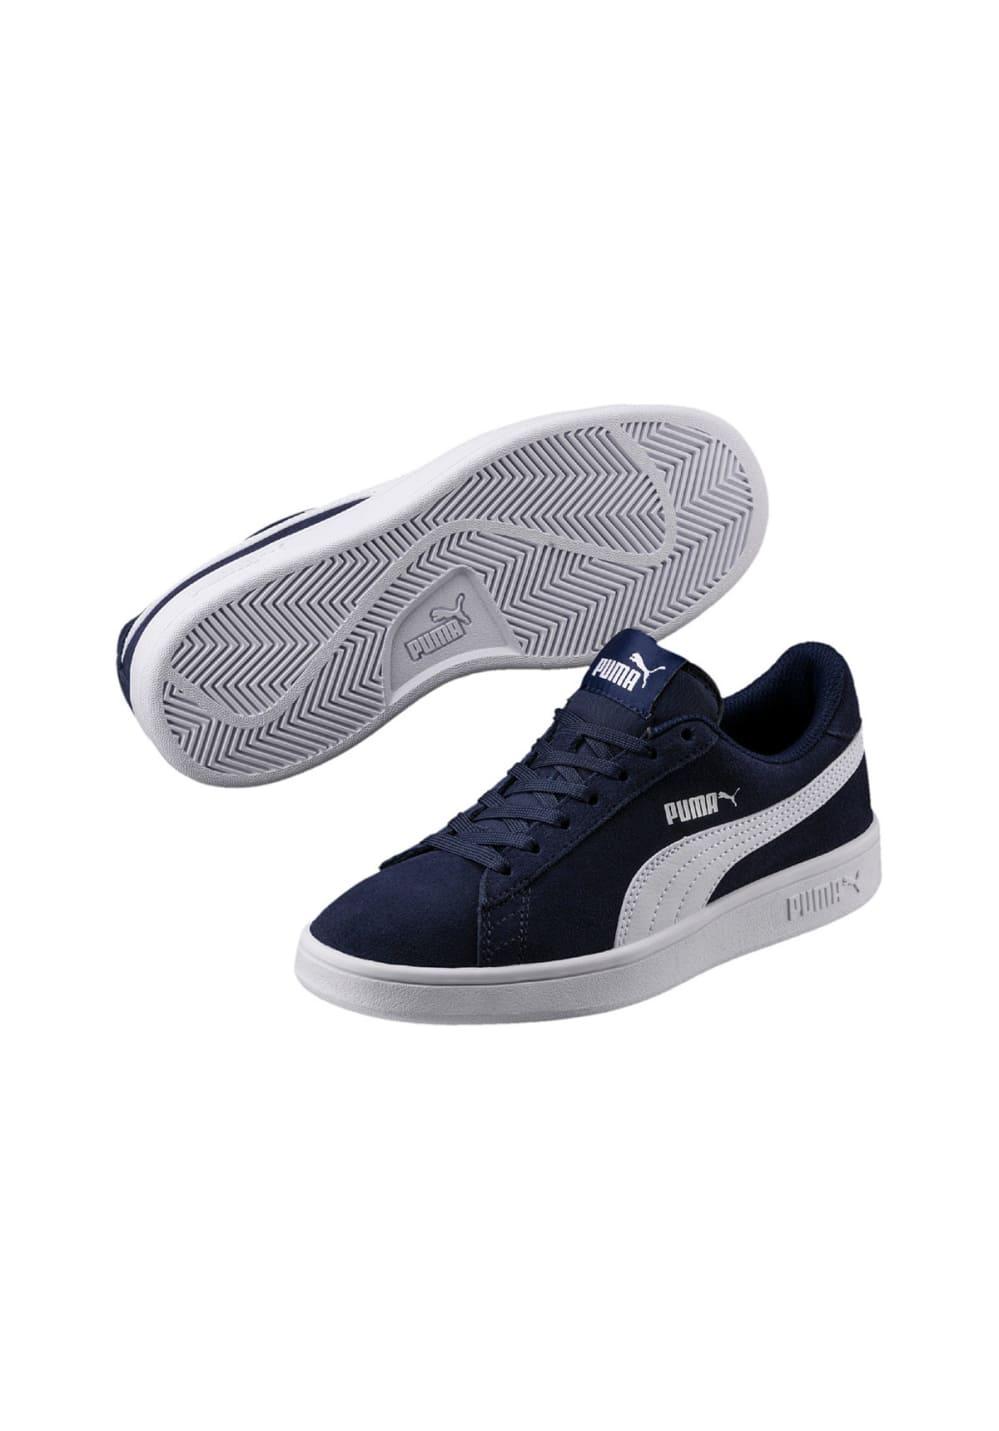 Puma Smash V2 Sd Jr - Sneaker für Kinder Unisex - Grau